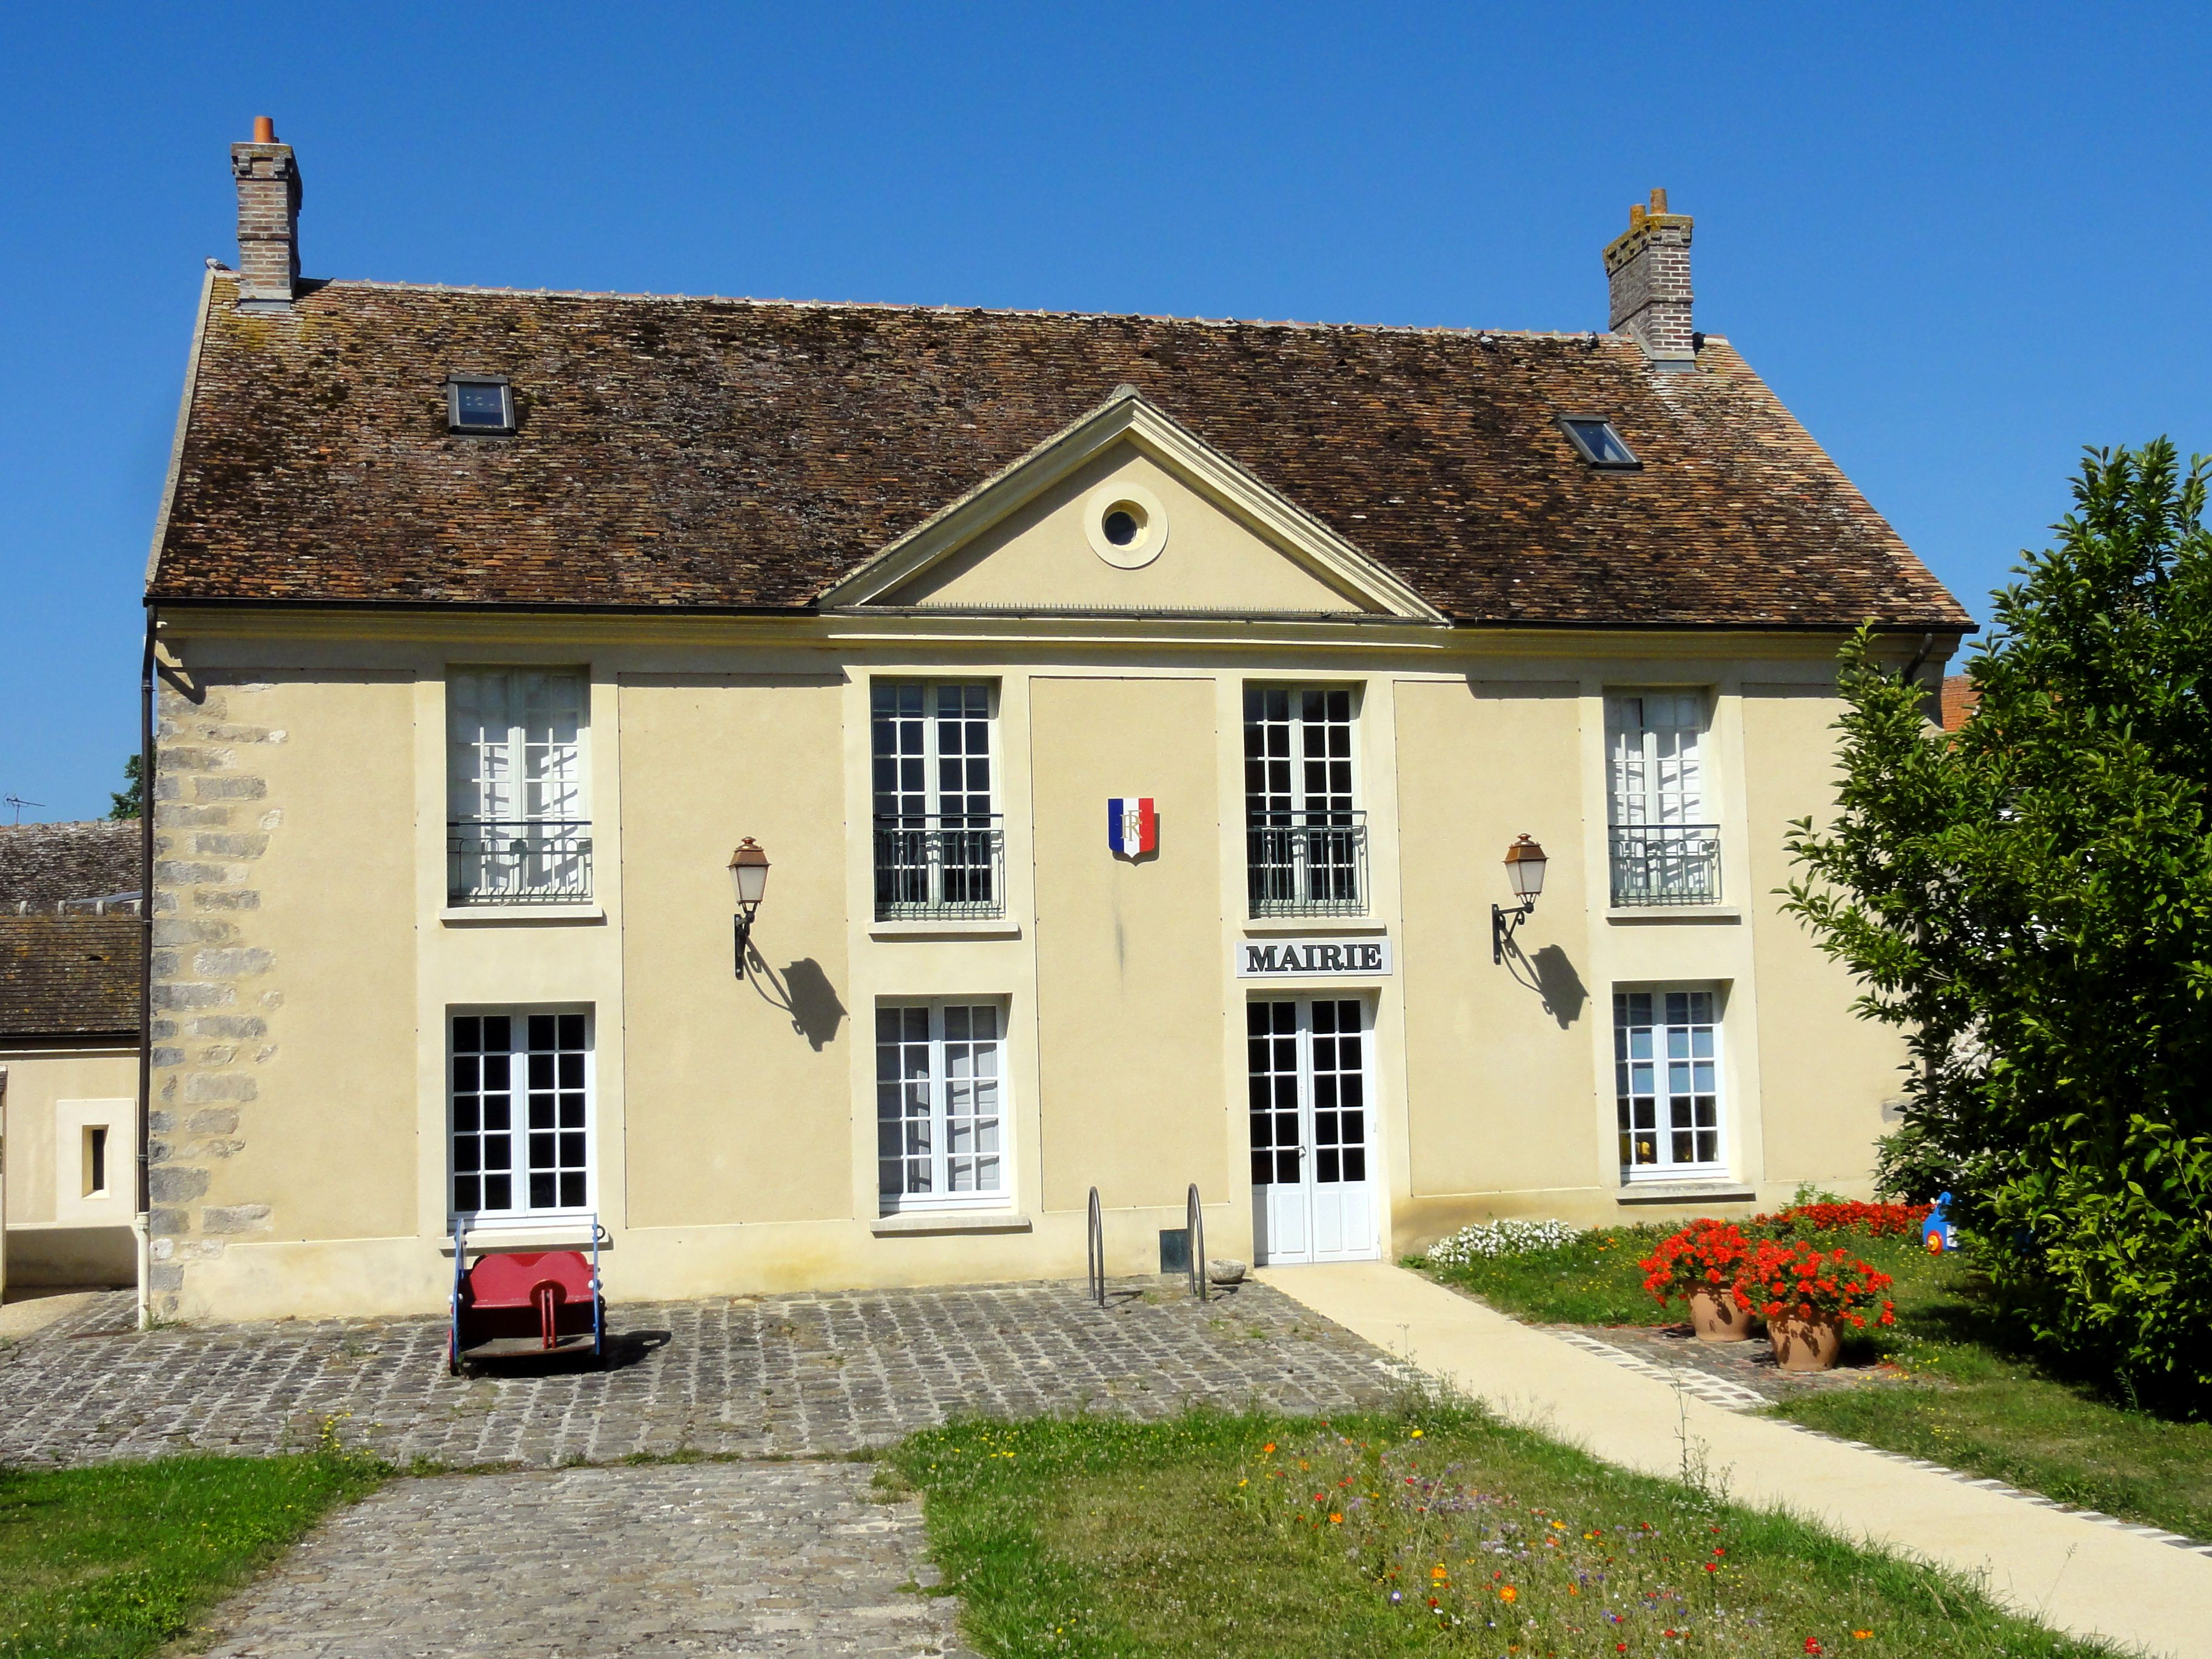 Champeaux seine et marne wikiwand - Office du tourisme seine et marne ...